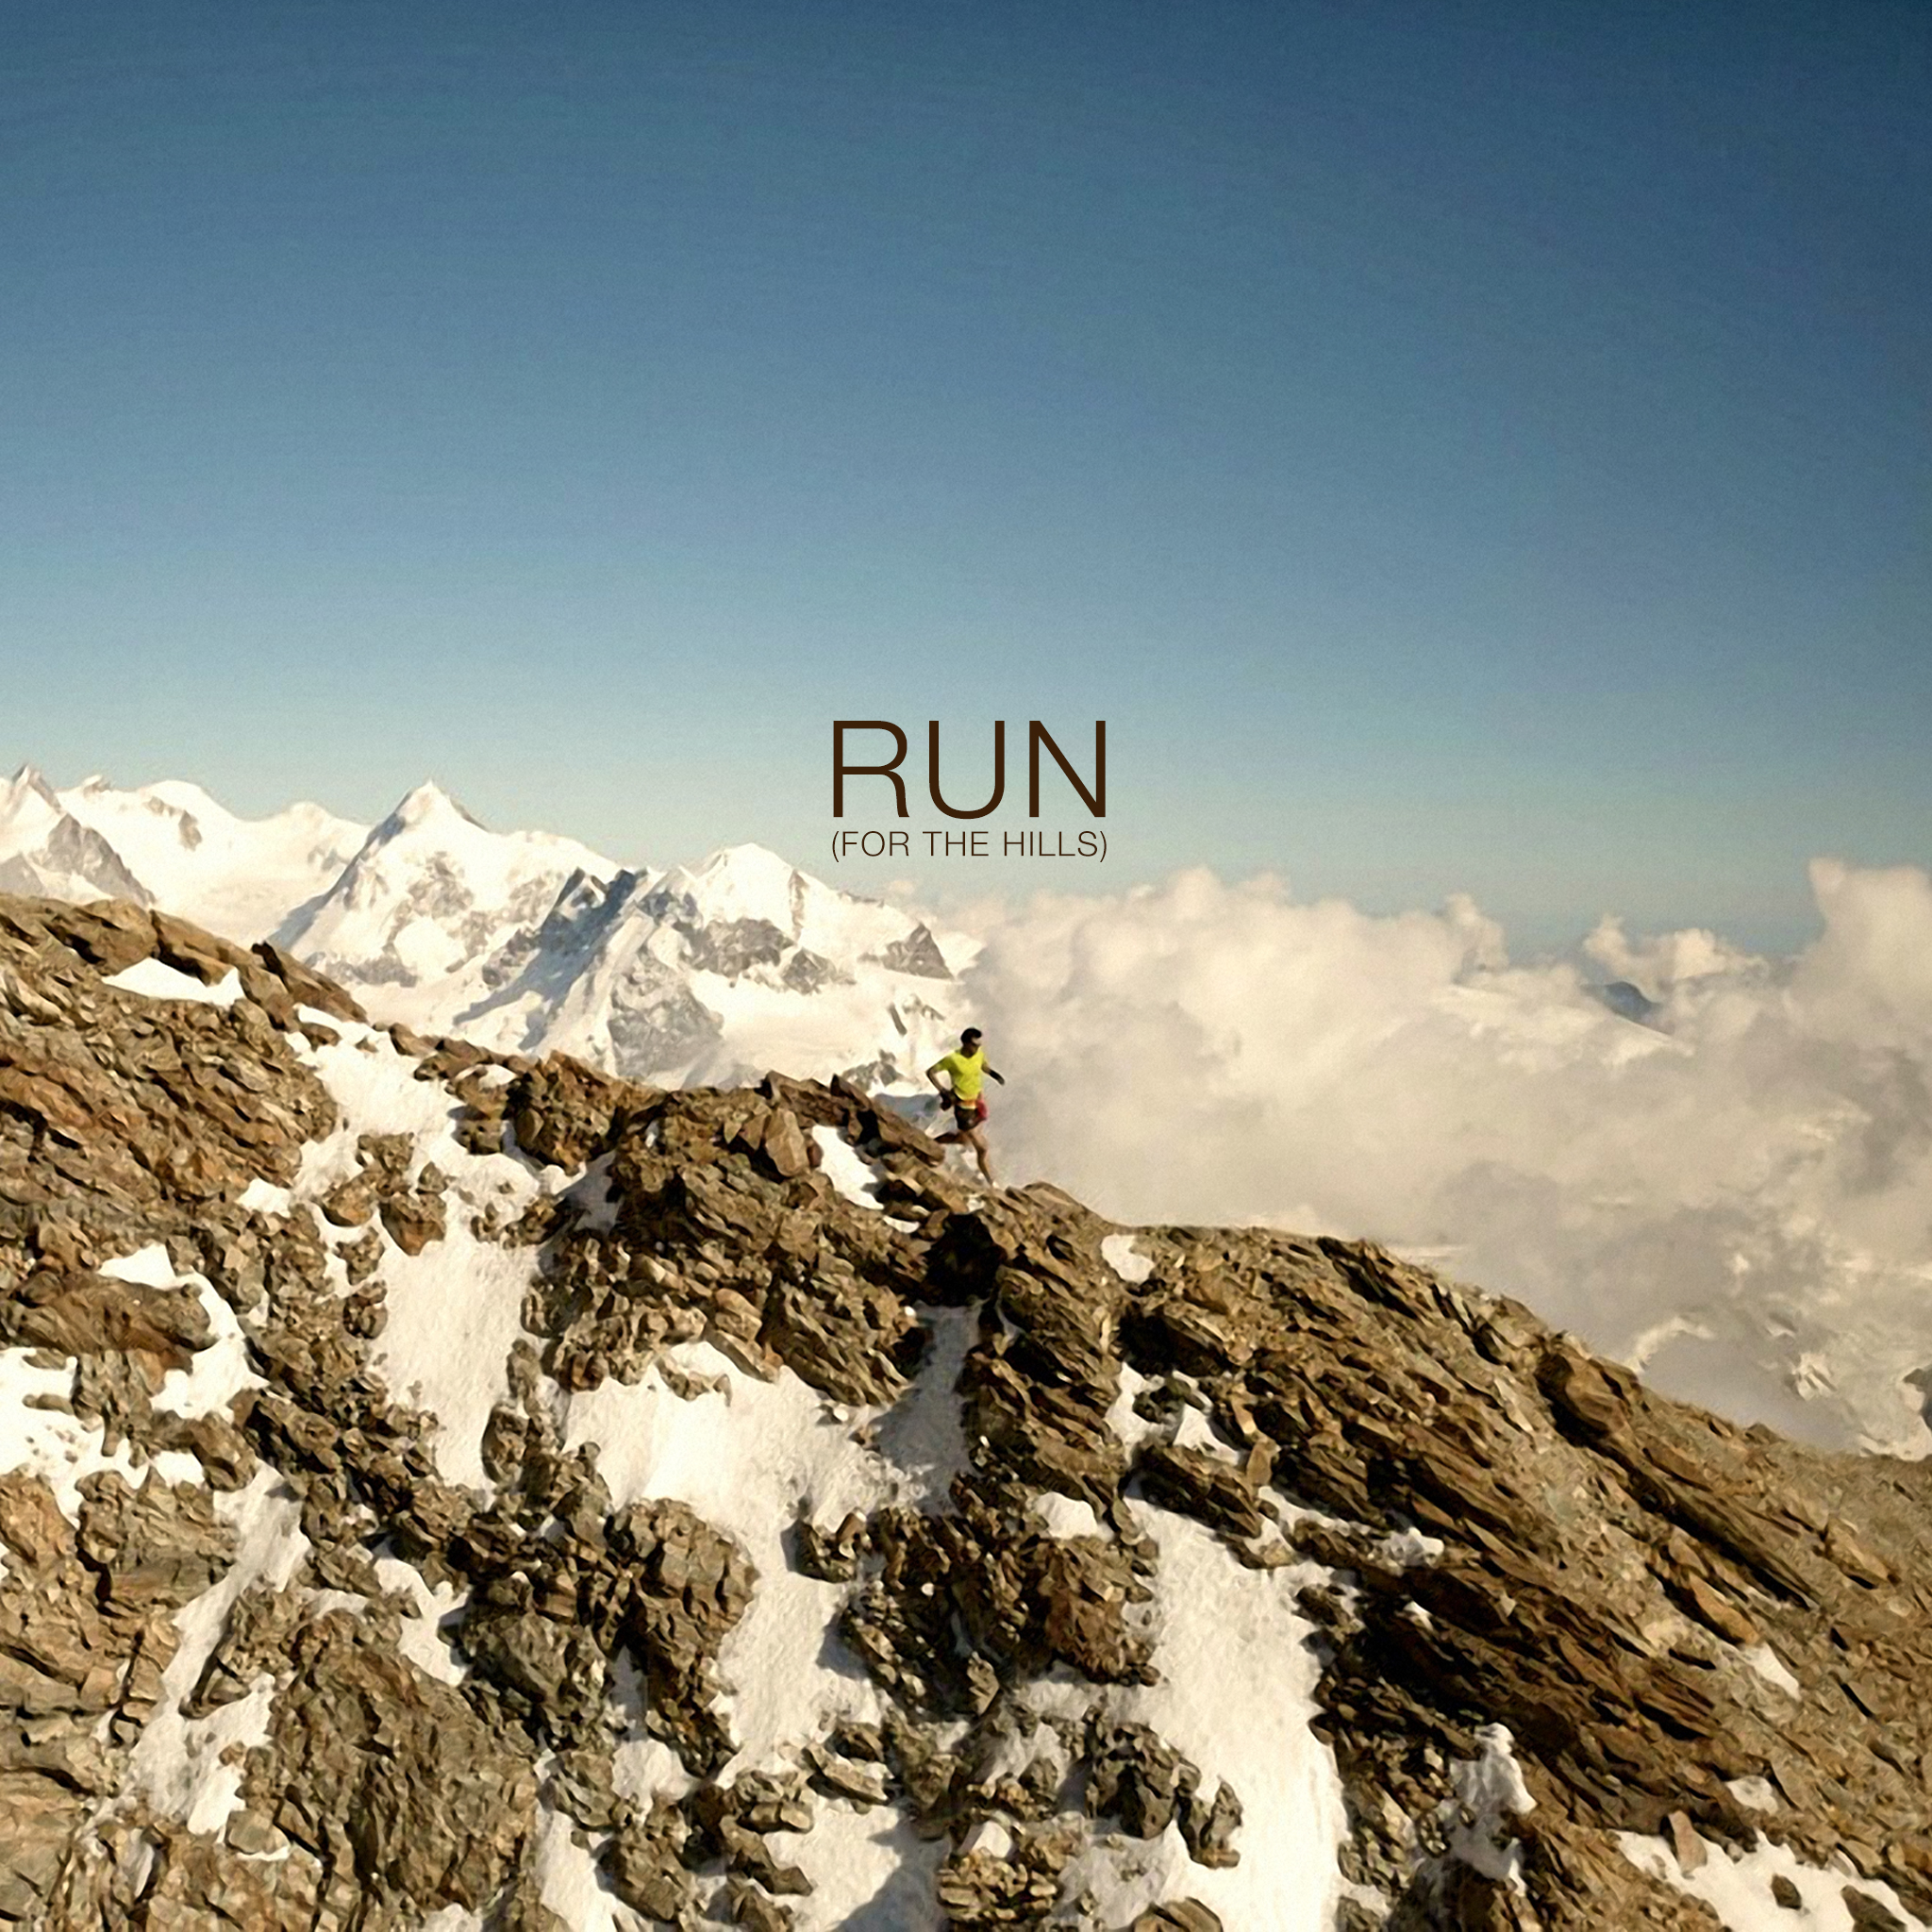 Nike Running Backgrounds Run for the hills wallpaper 2048x2048